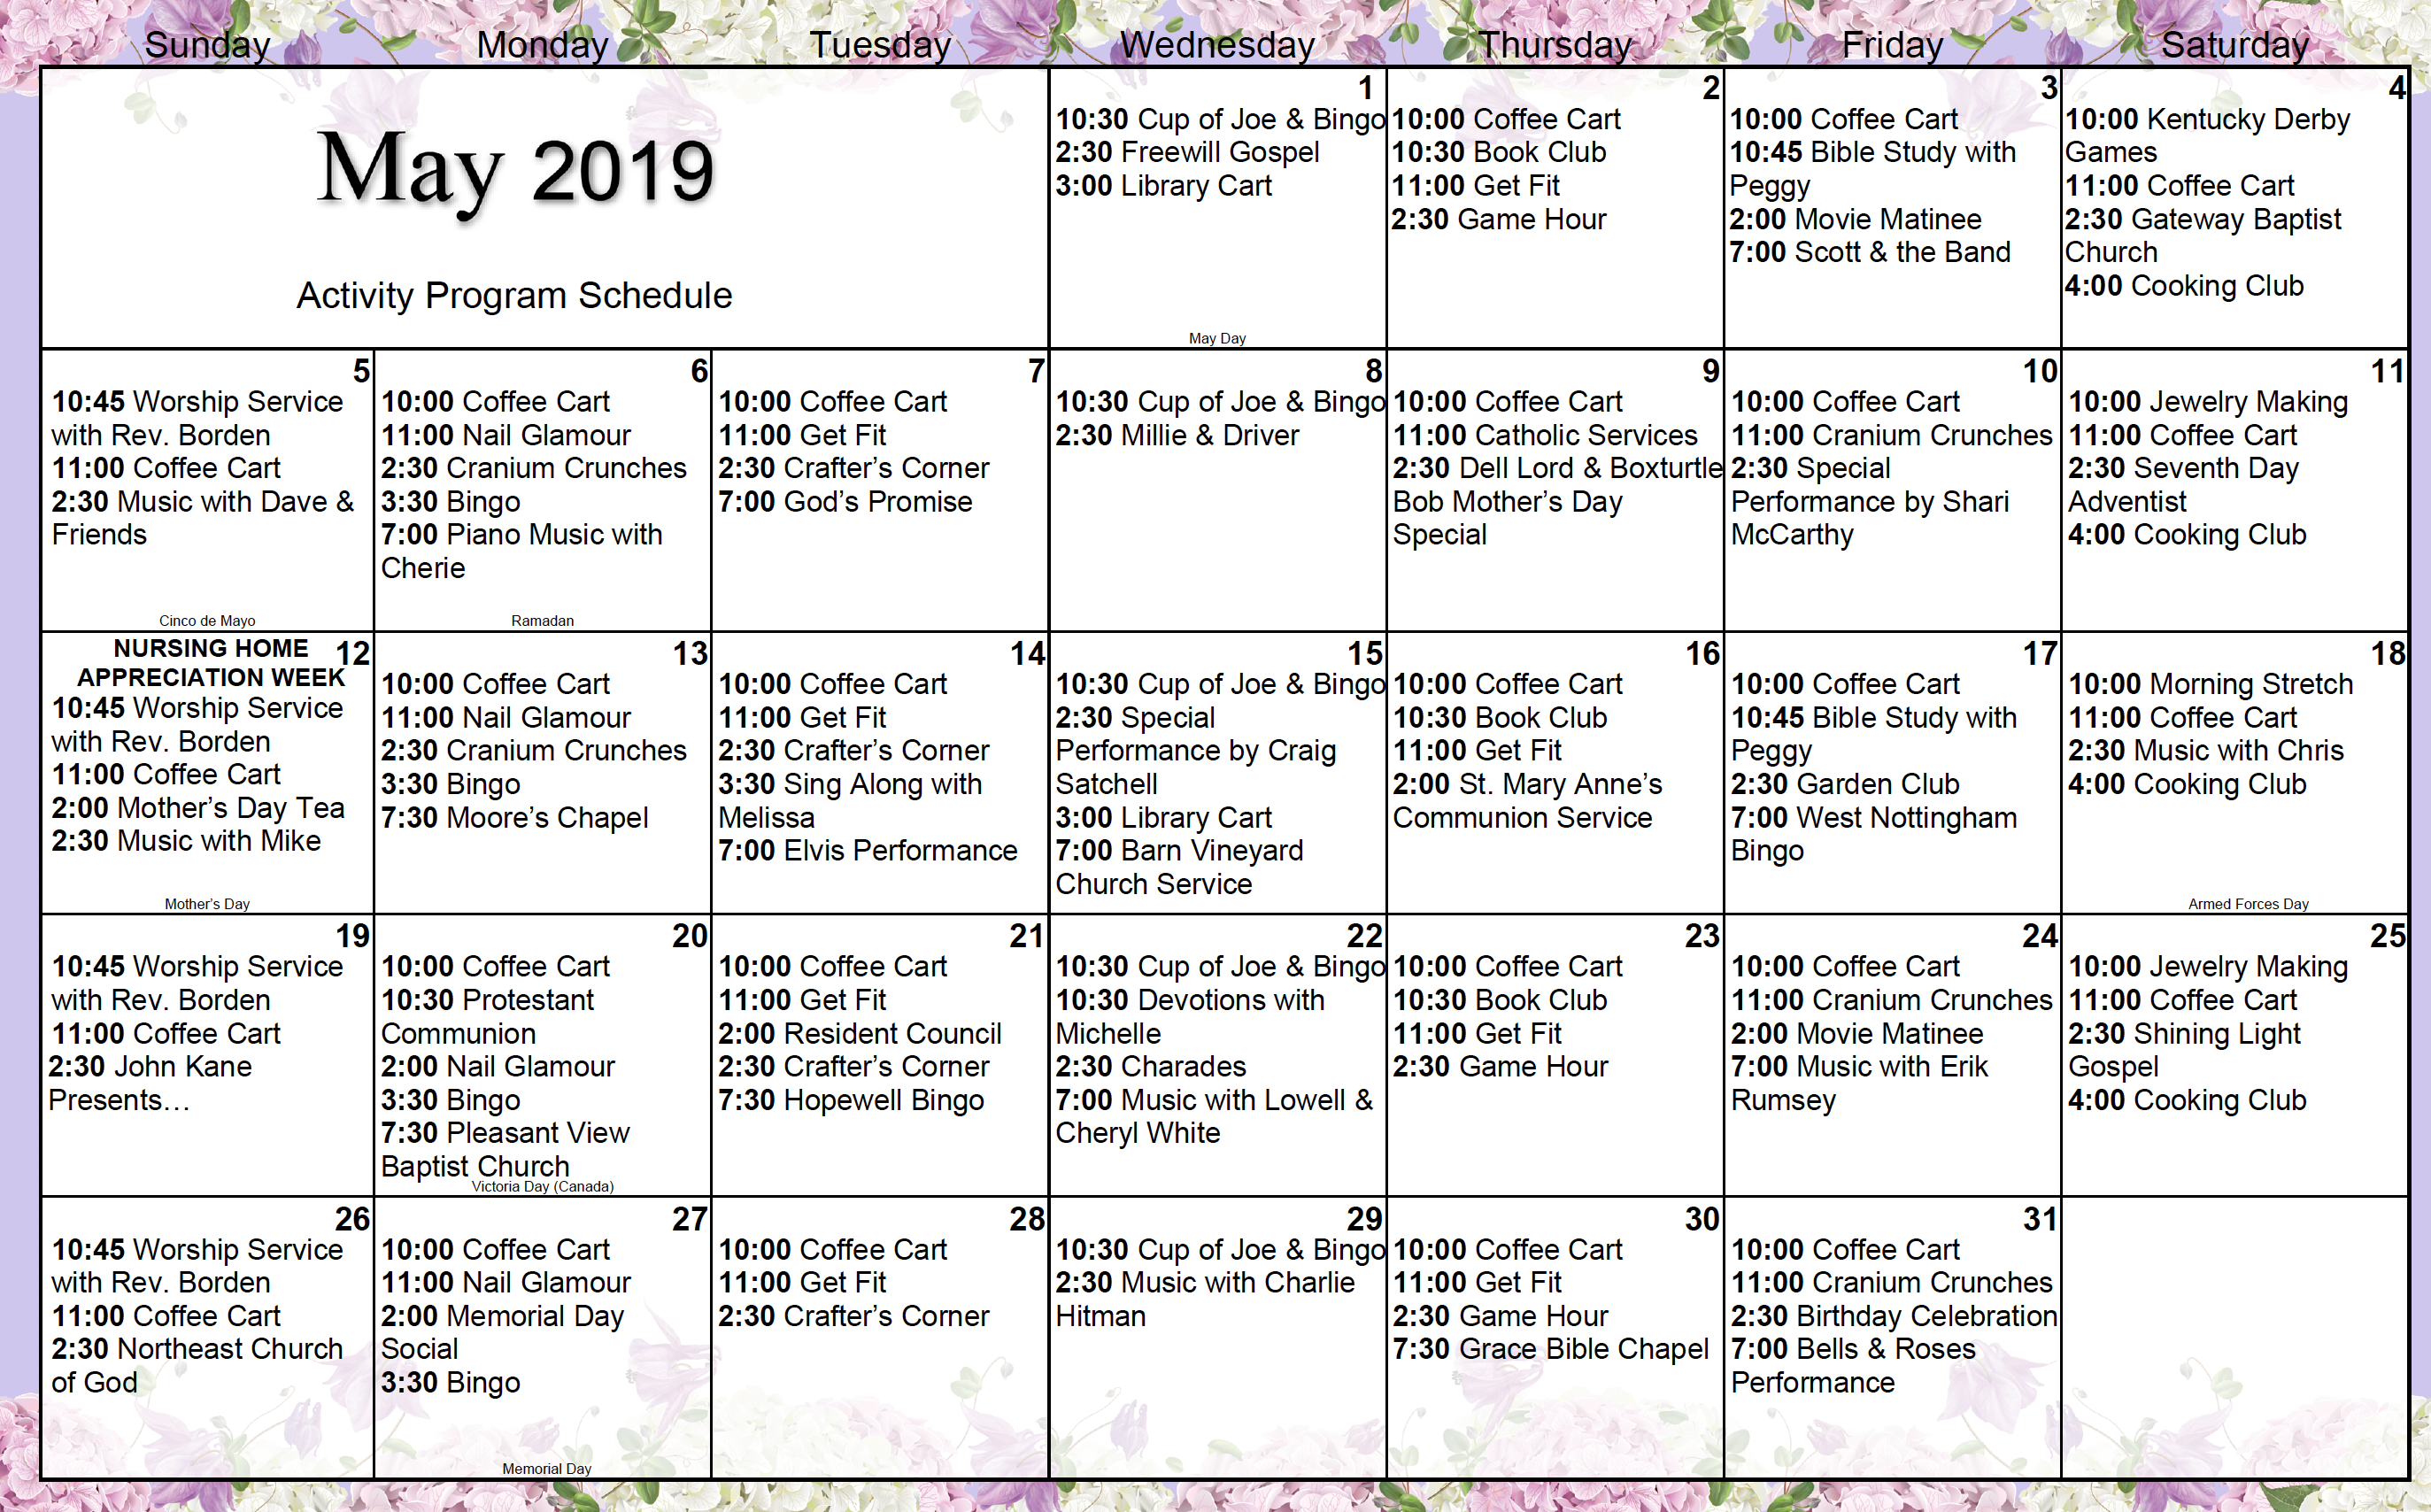 Calvert Manor's May 2019 resident activity calendar